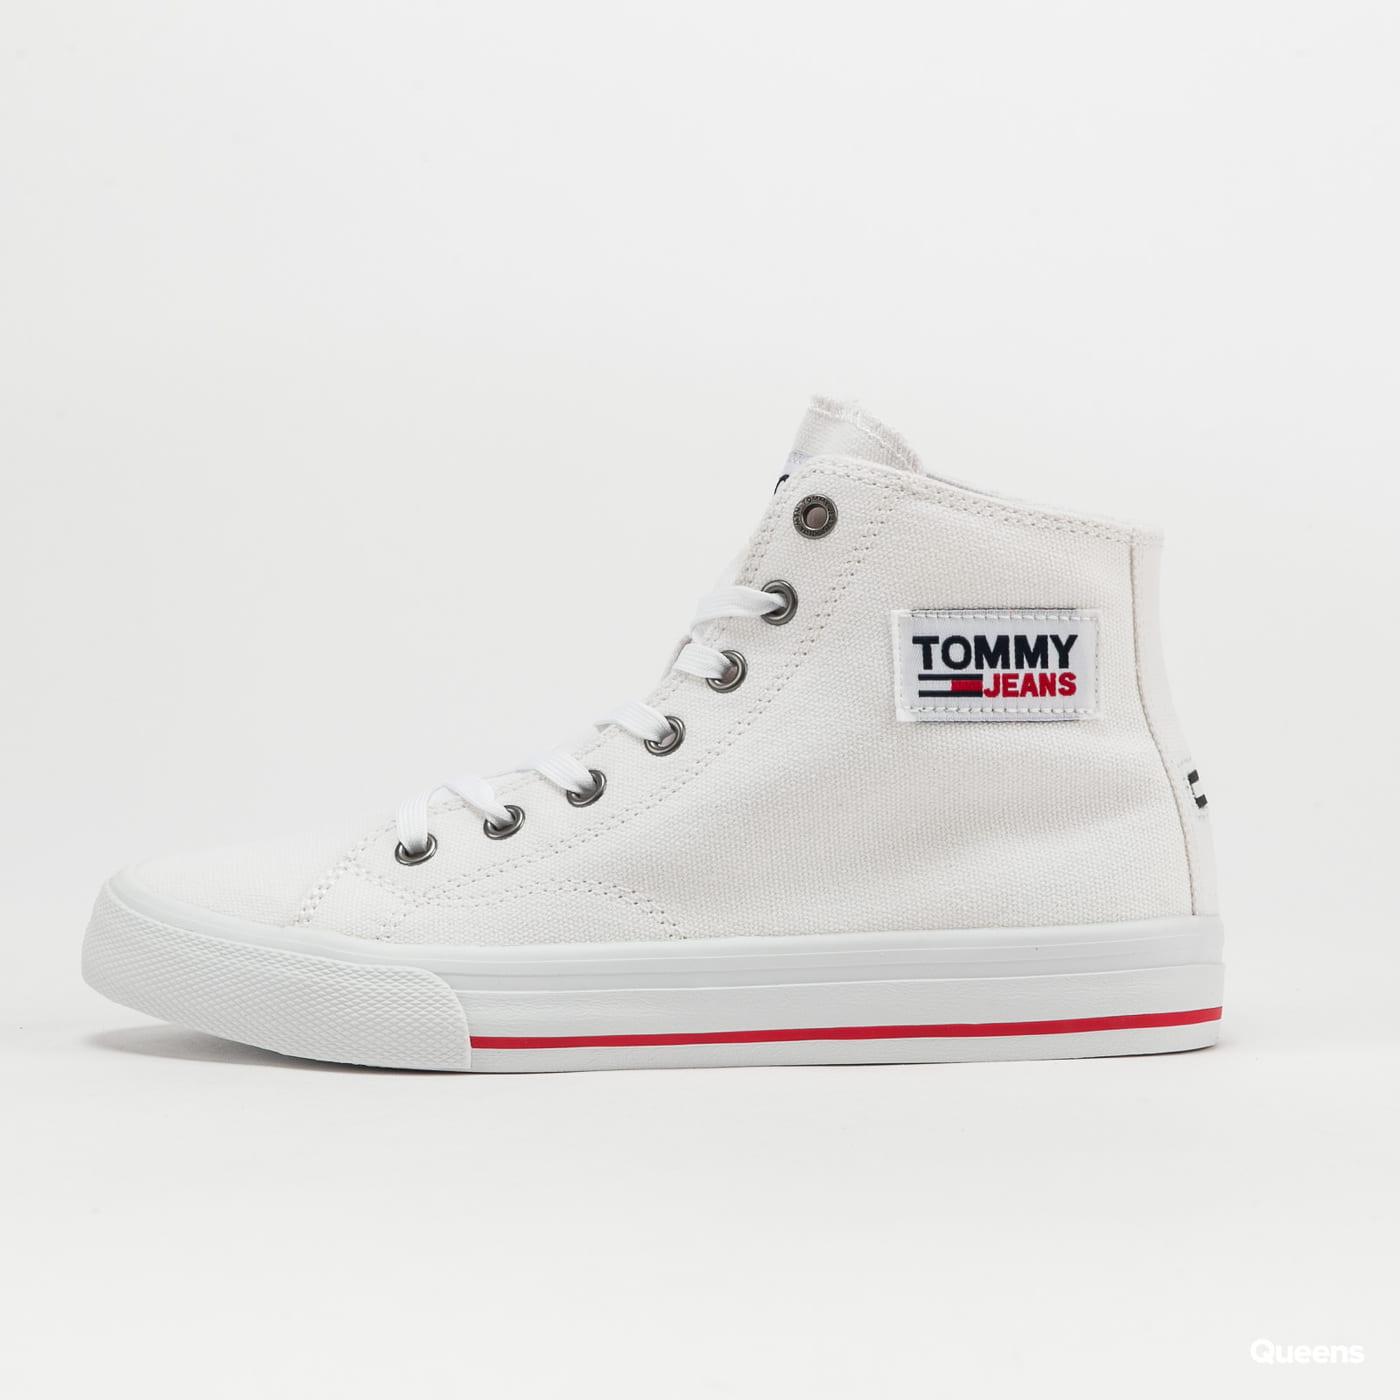 TOMMY JEANS Tommy Jeans Midcut Vulc wht